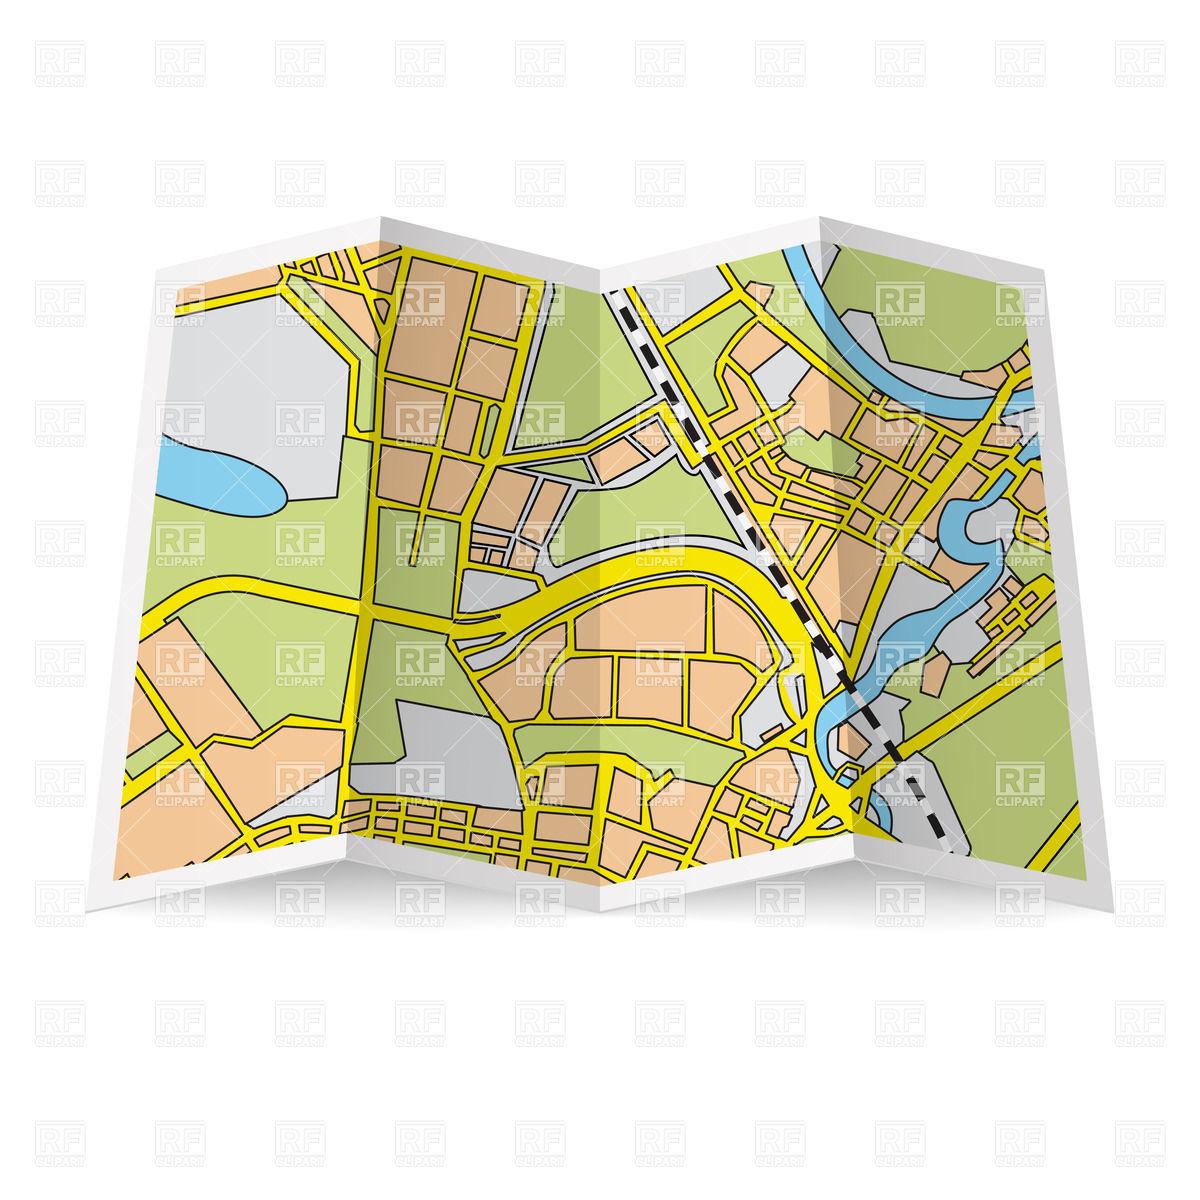 Clipart road map banner transparent download Folded road map clipart - ClipartFest banner transparent download